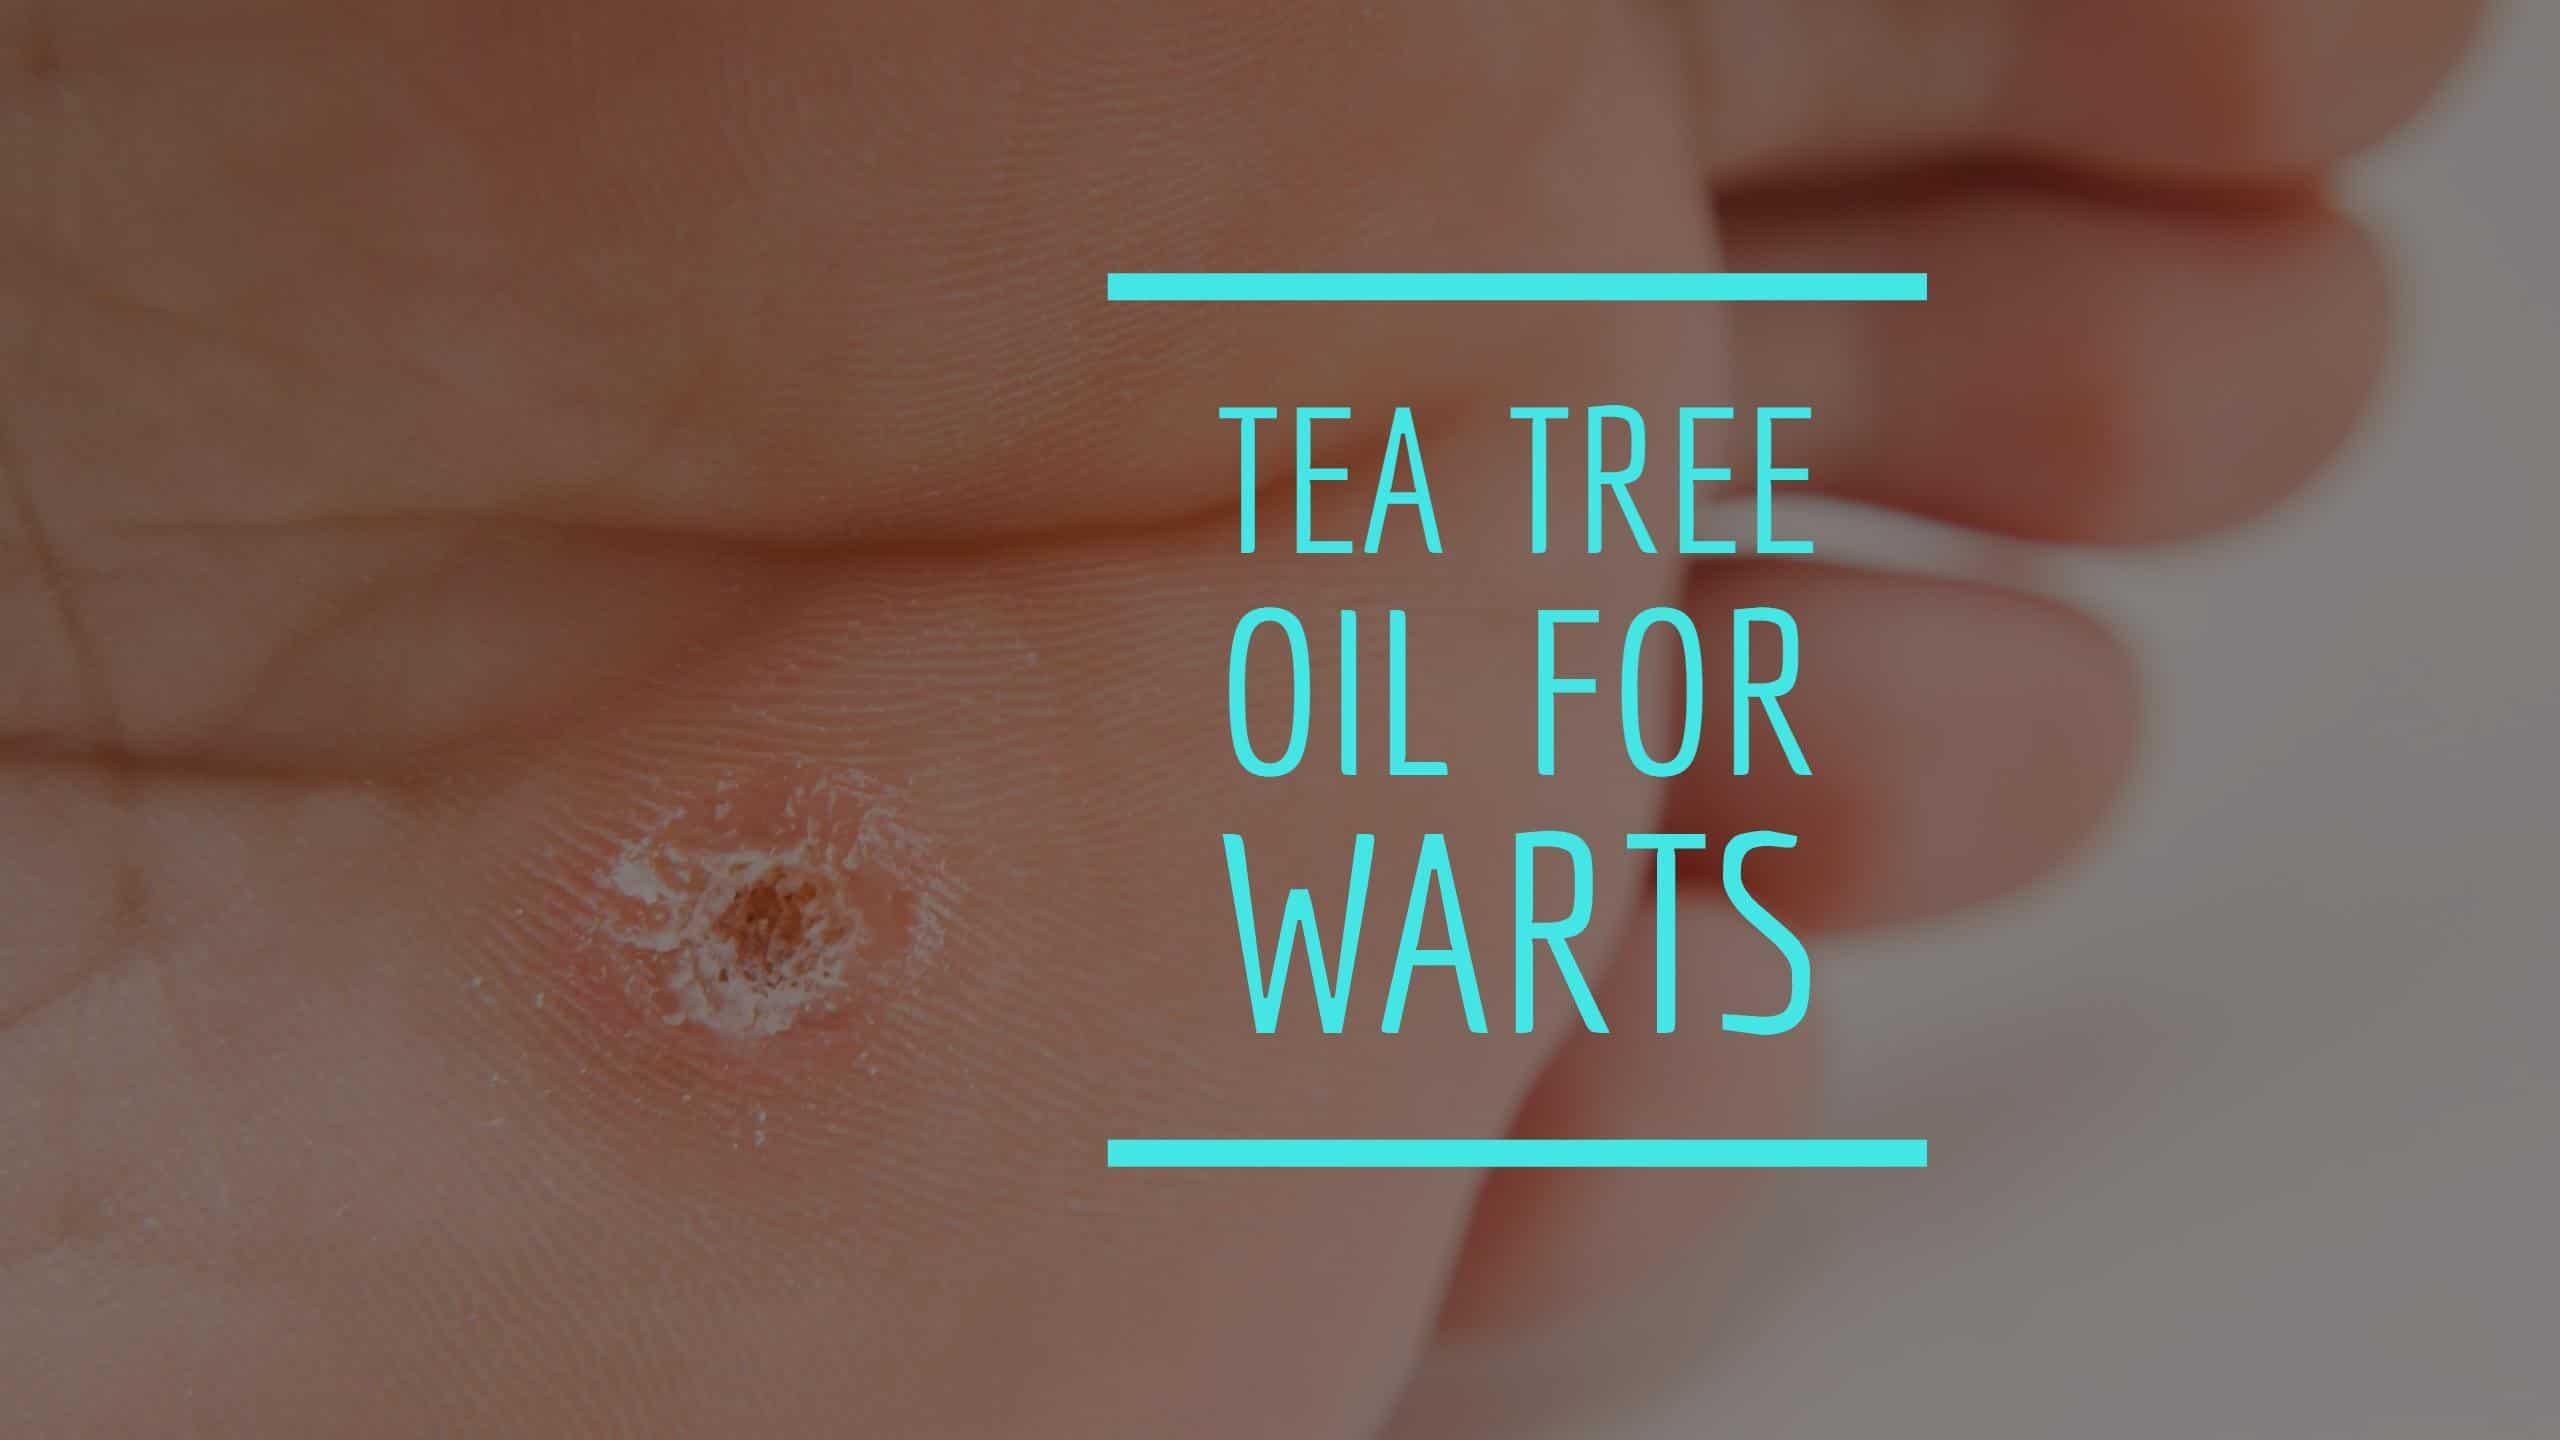 wart treatment tea tree oil